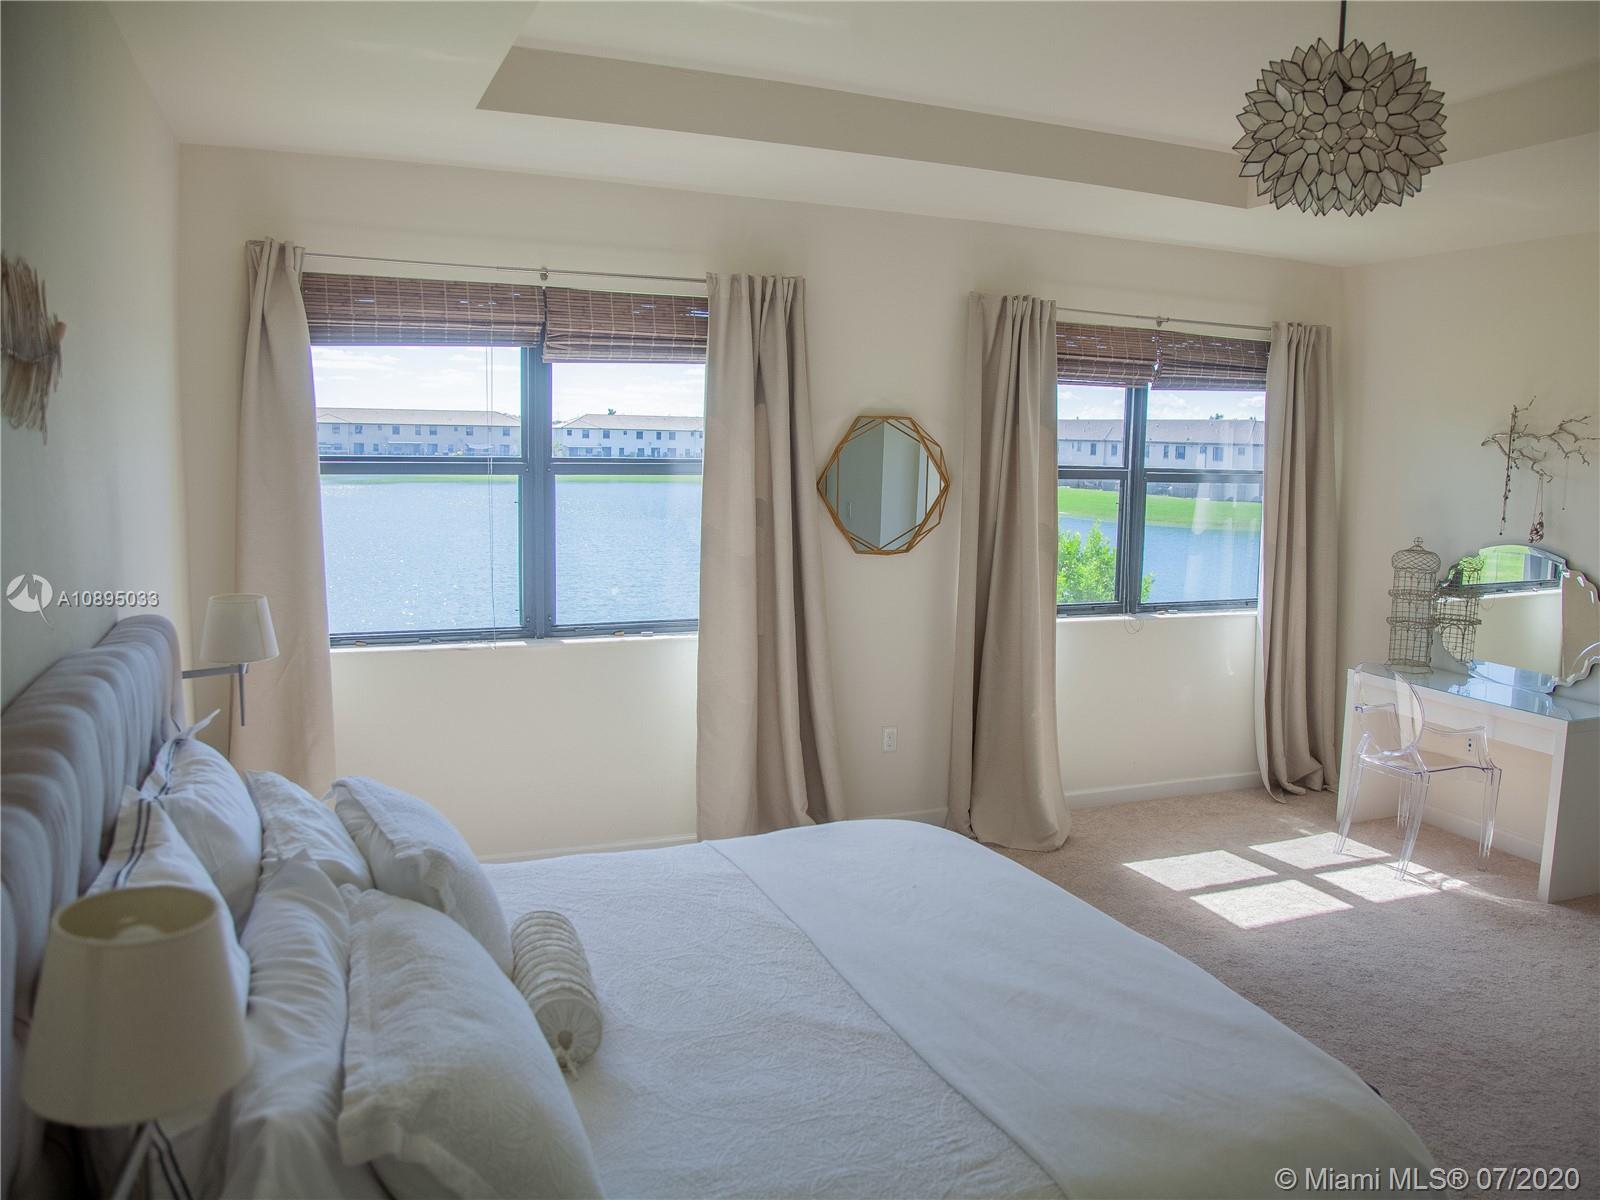 25201 SW 117th PL Property Photo - Homestead, FL real estate listing